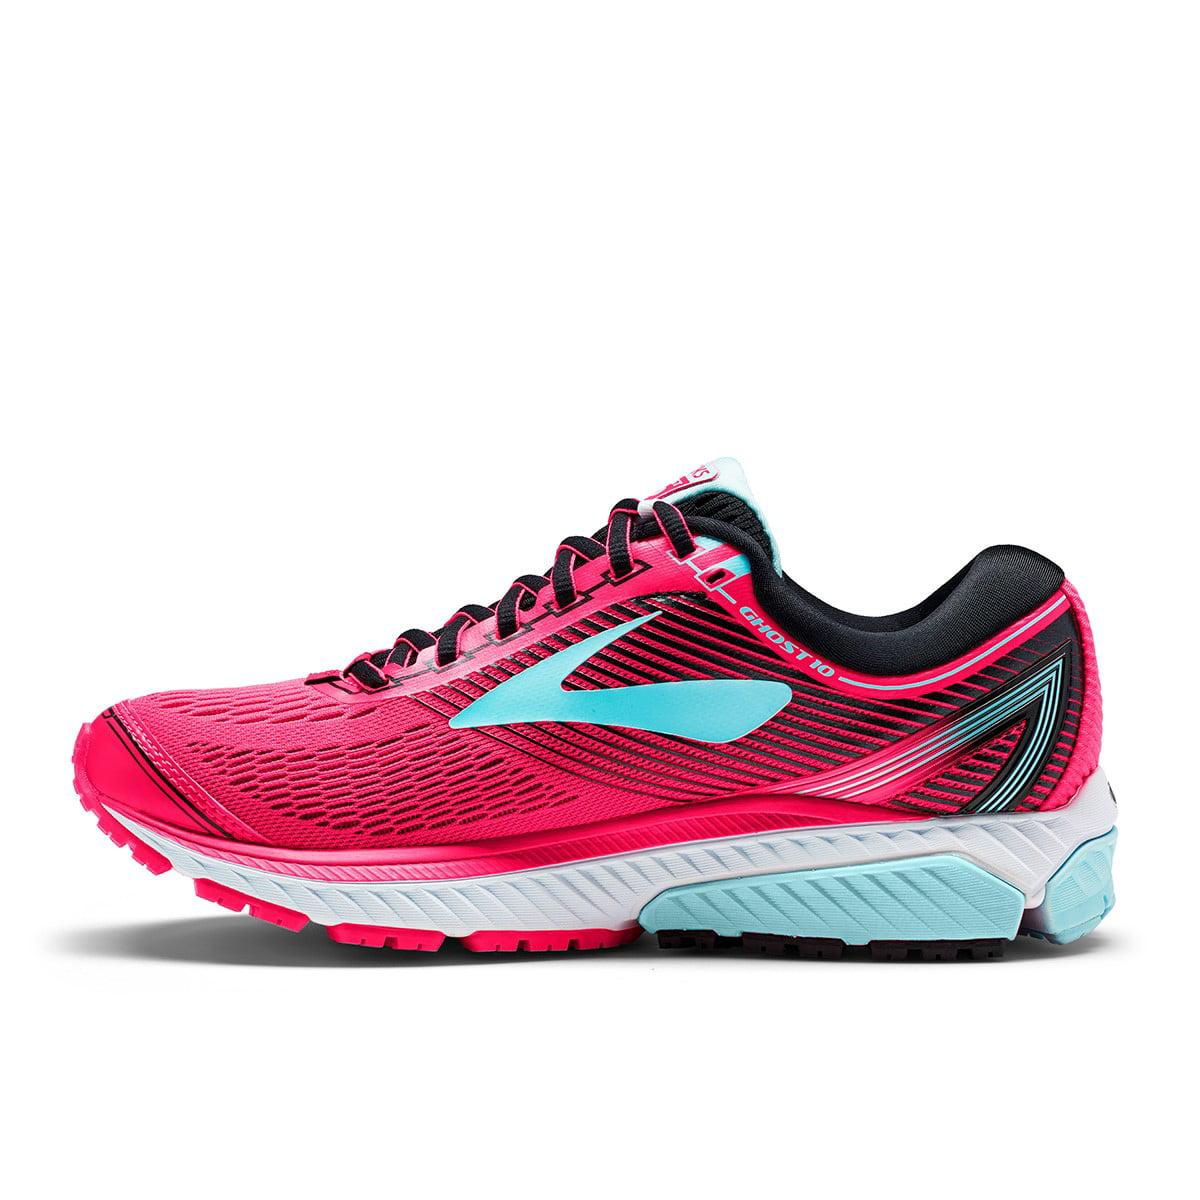 5cacfaaa5848d Brooks Women s Ghost 10 Running Shoes (Diva Pink